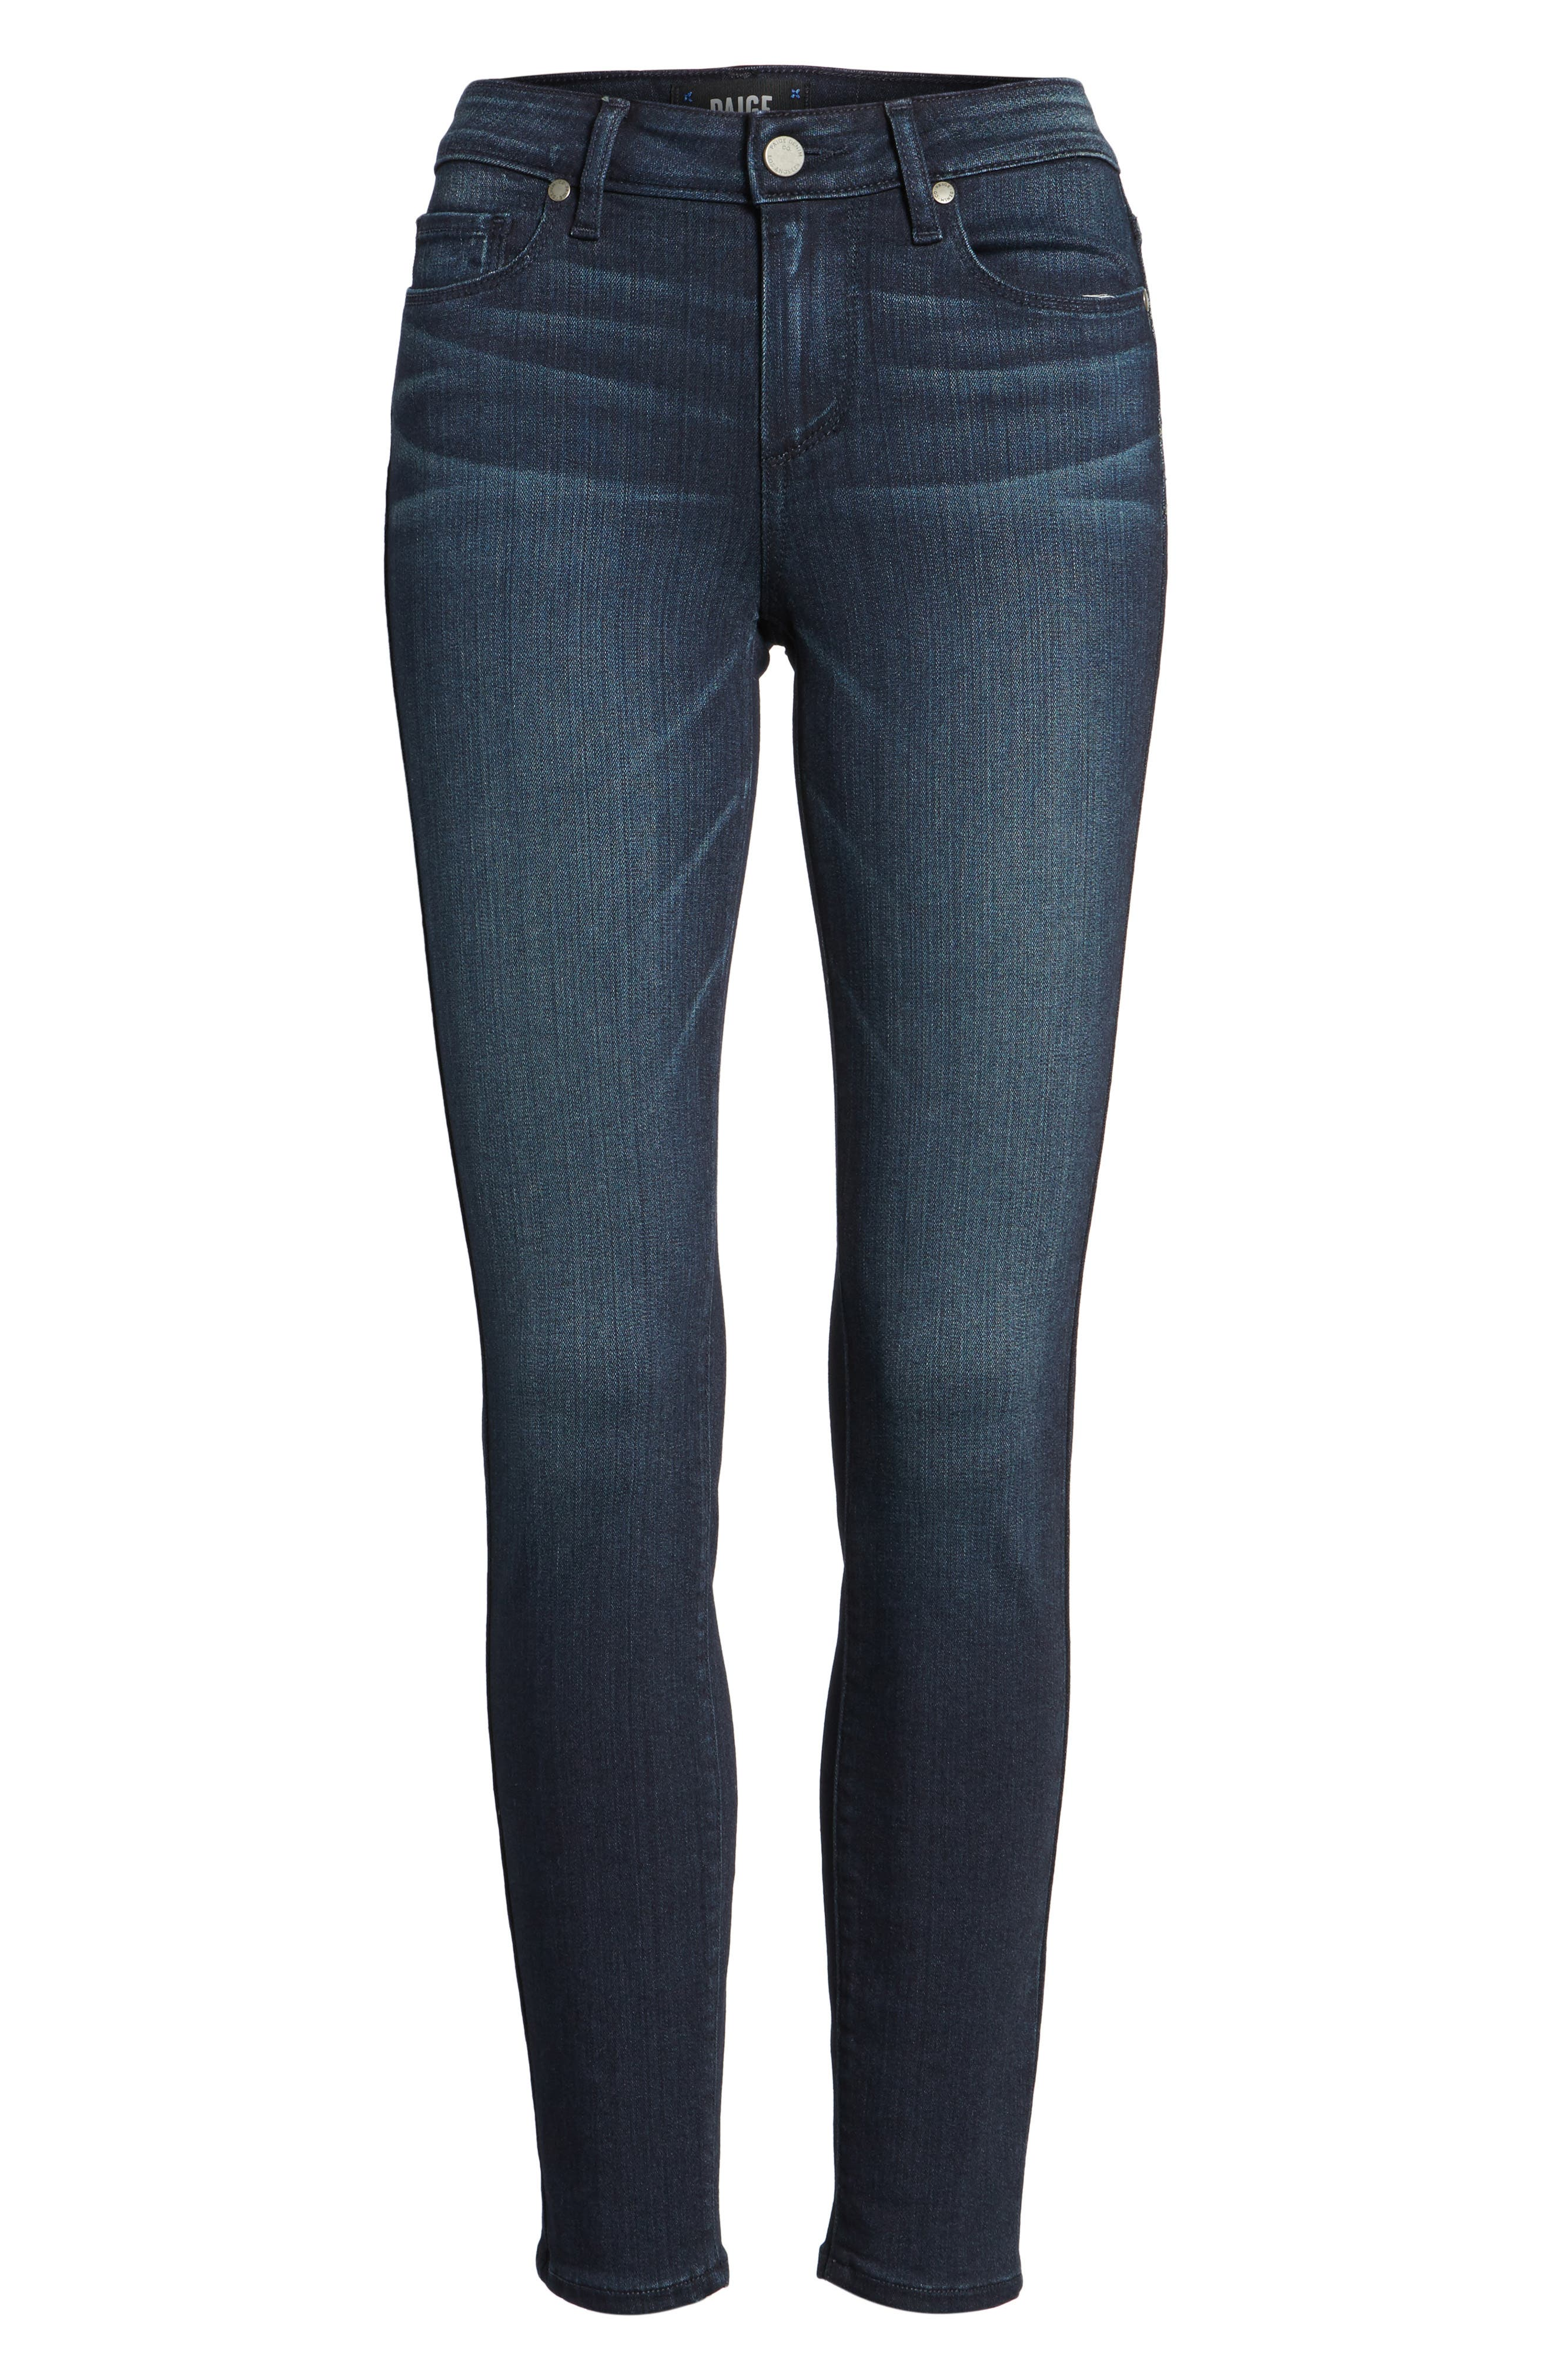 Transcend - Verdugo Ankle Skinny Jeans,                             Alternate thumbnail 7, color,                             Midlake